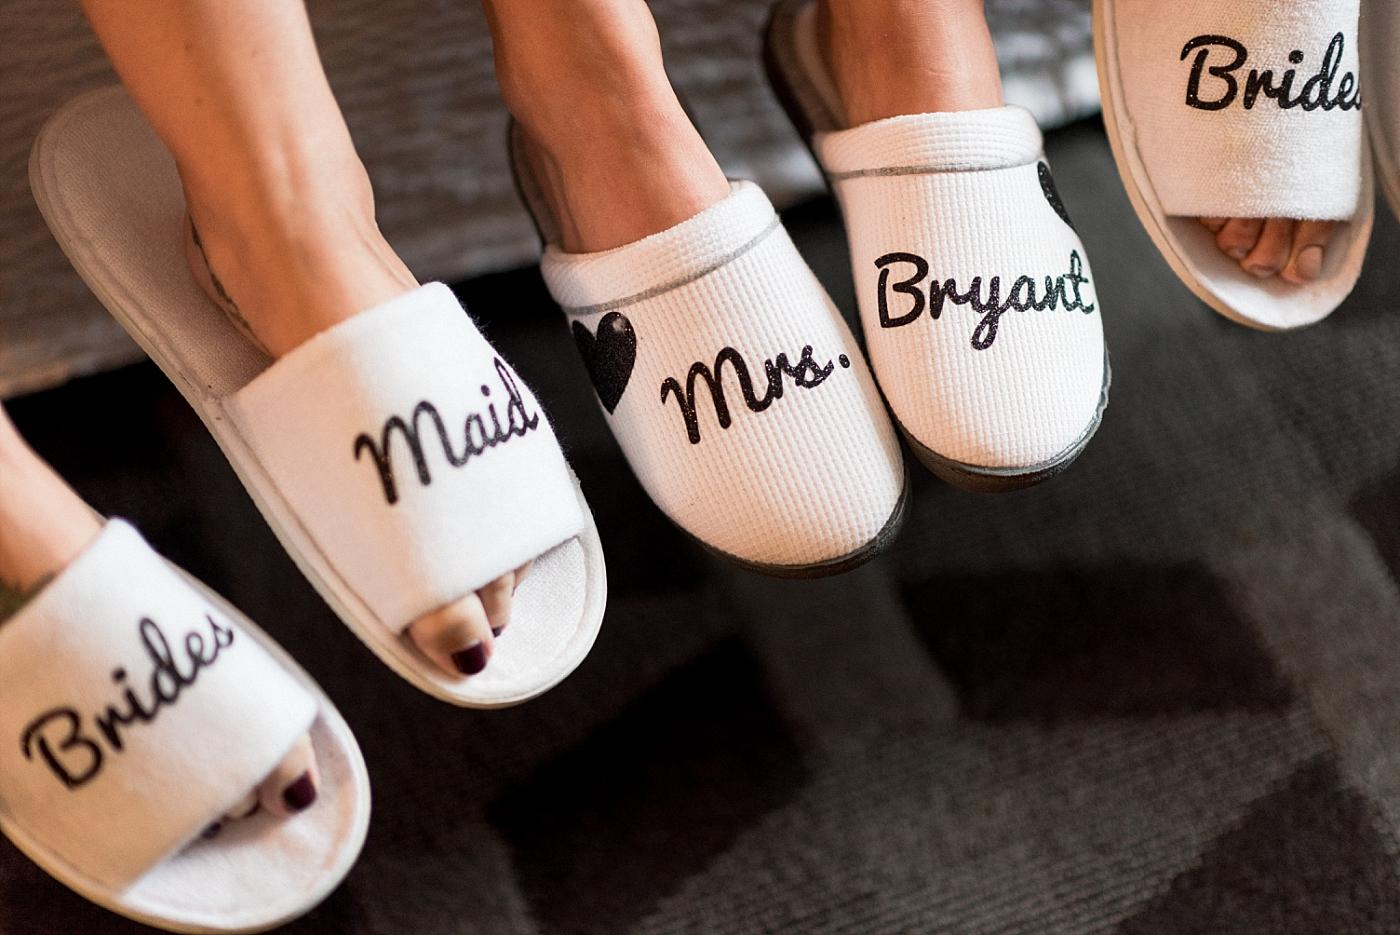 Bridesmaids bride wedding slippers wedding party